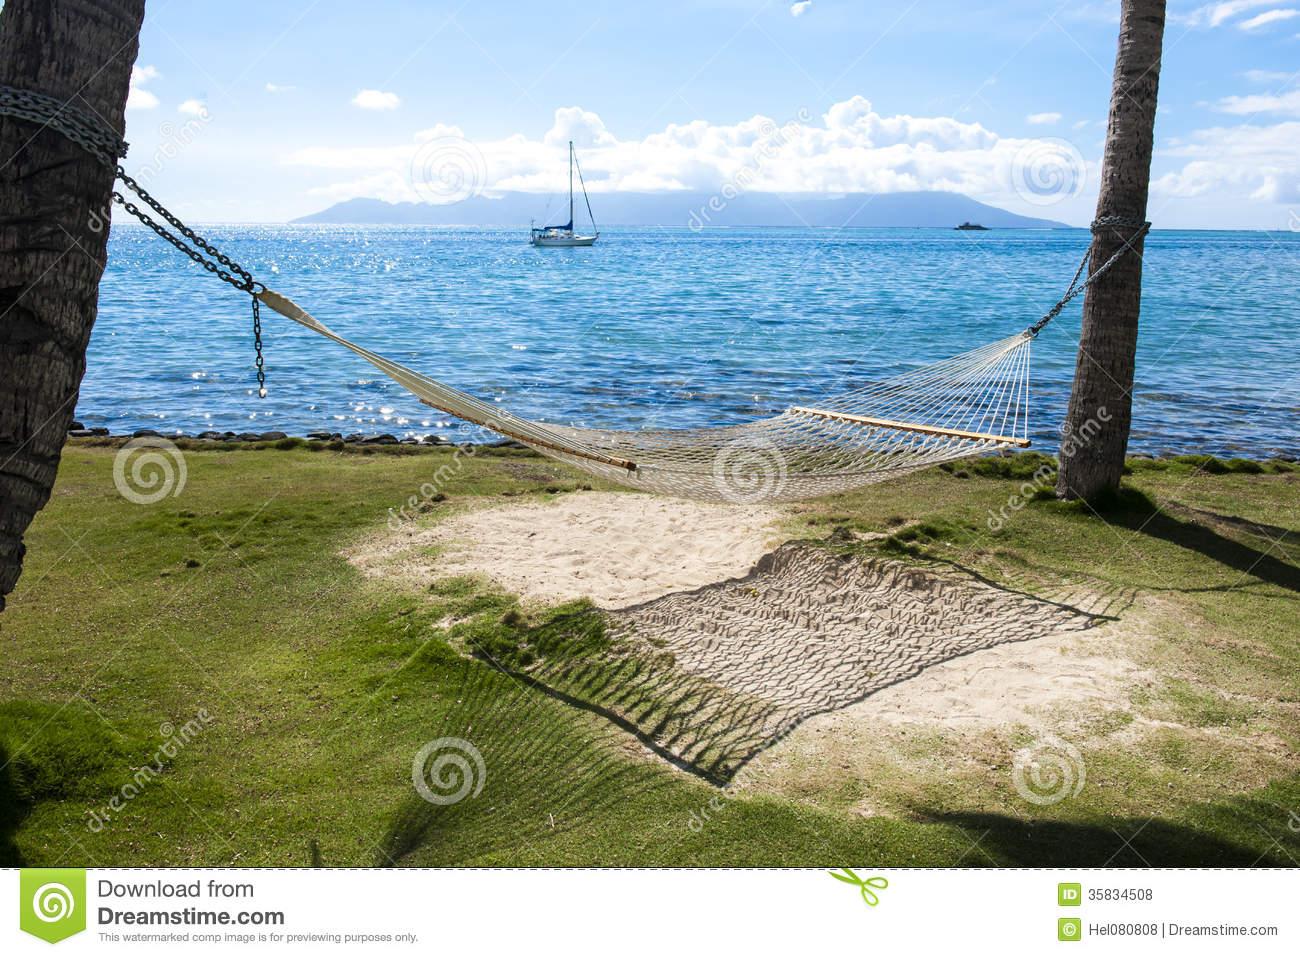 Caribbean Beach Hammock And Palm Trees In Mayan Riviera Mexico 1300x957